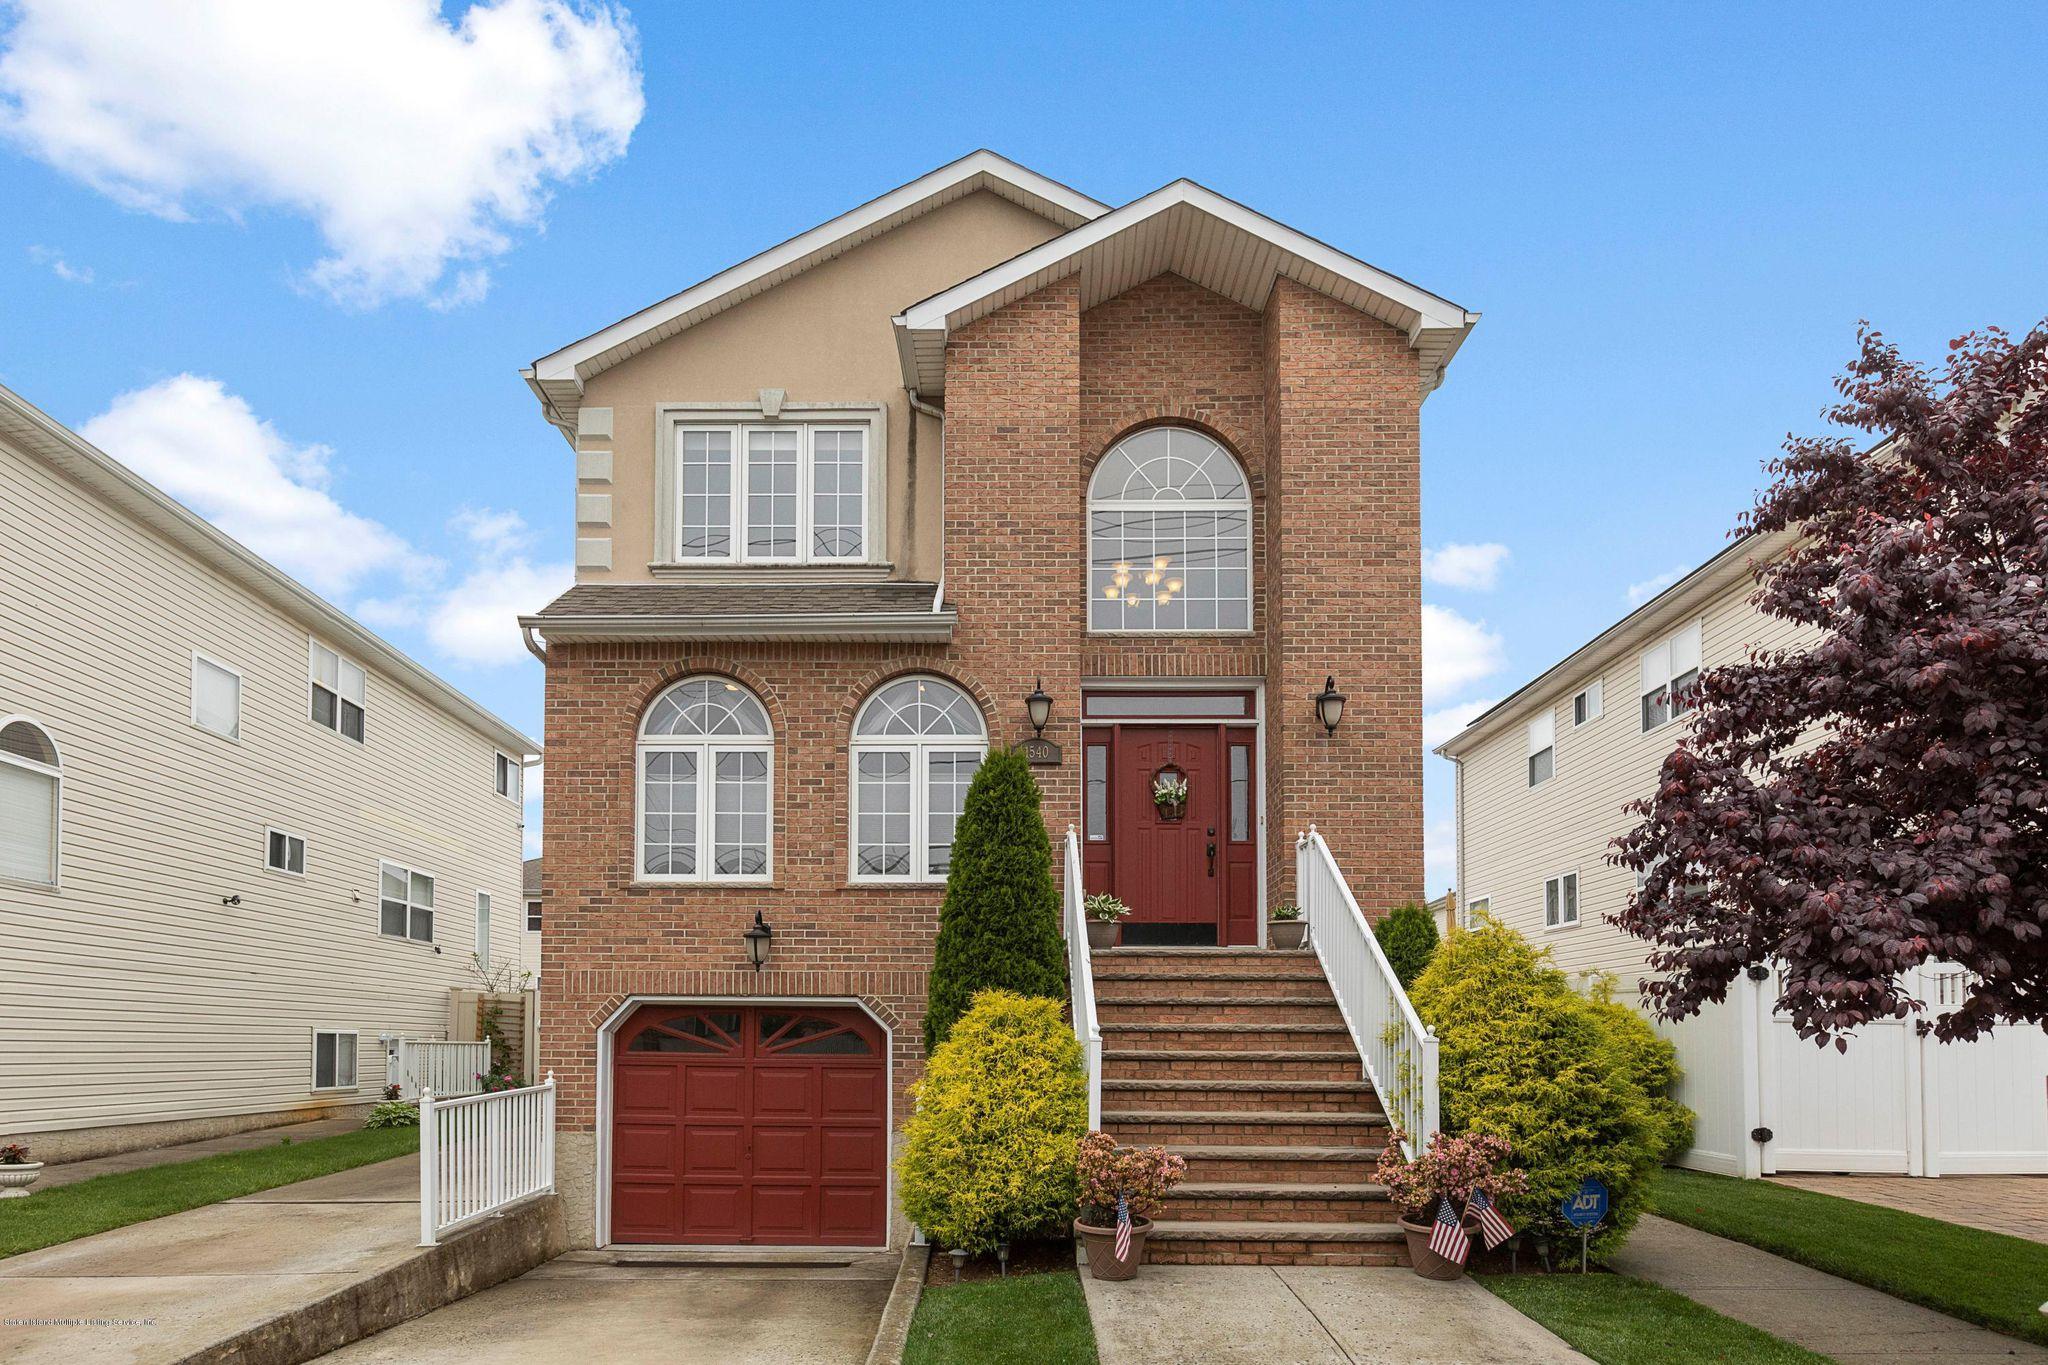 1540 Drumgoole Rd W, Staten Island, NY 10312 - 5 Bed, 5 Bath Multi-Family -  MLS #1129392 - 27 Photos | Trulia